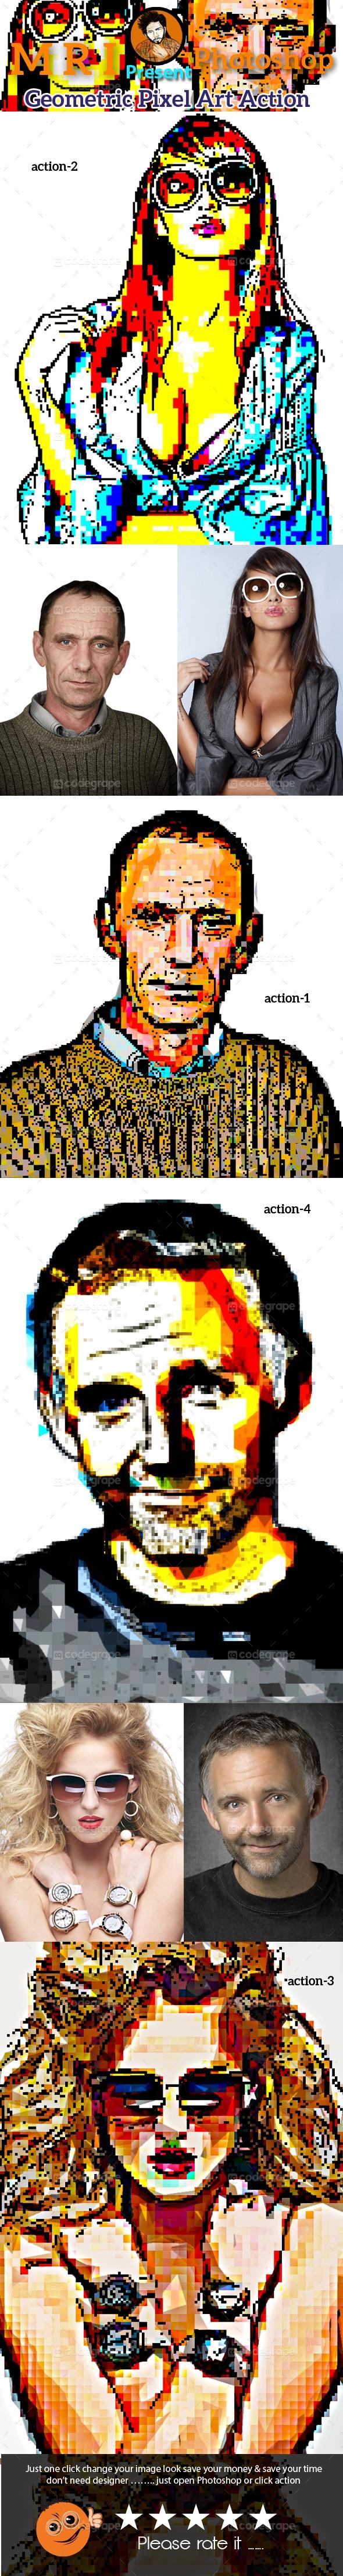 Geometric Pixel Art Action